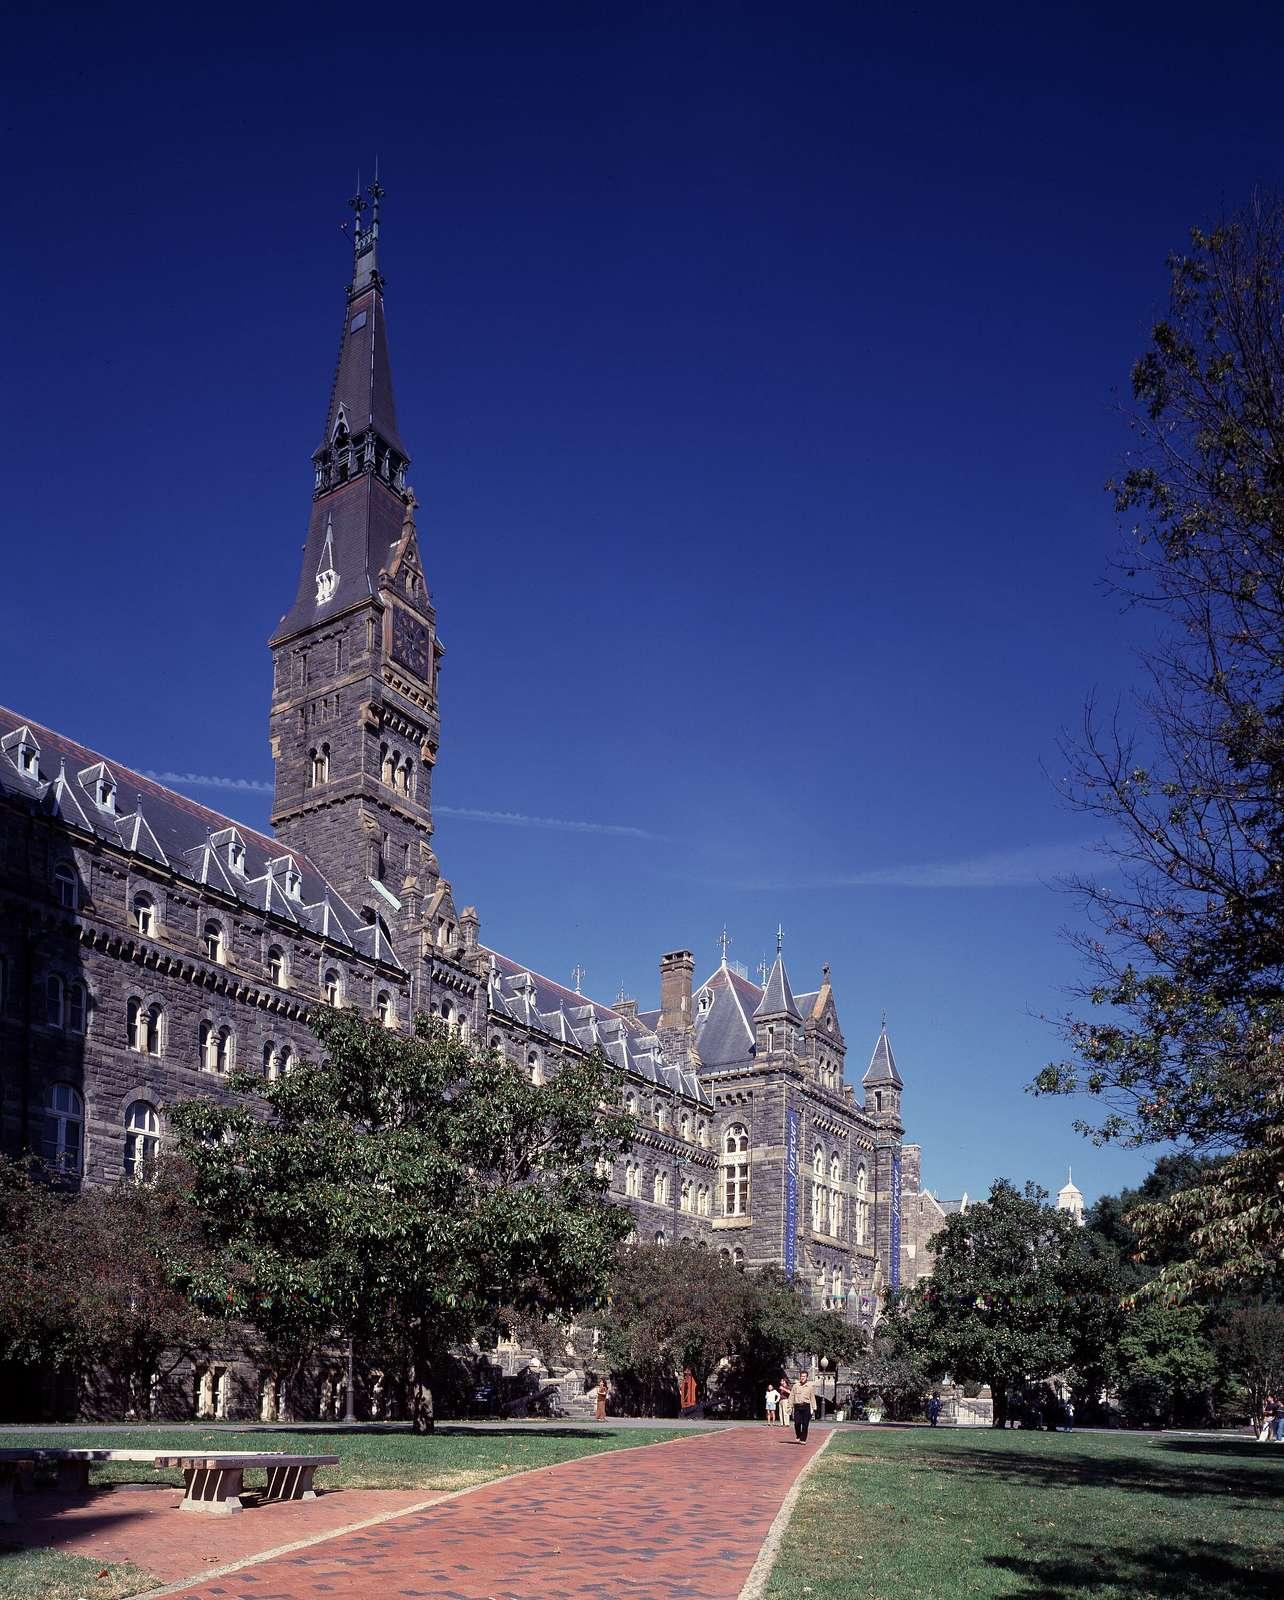 Georgetown University's flagship building, Healy Hall, Washington, D.C.